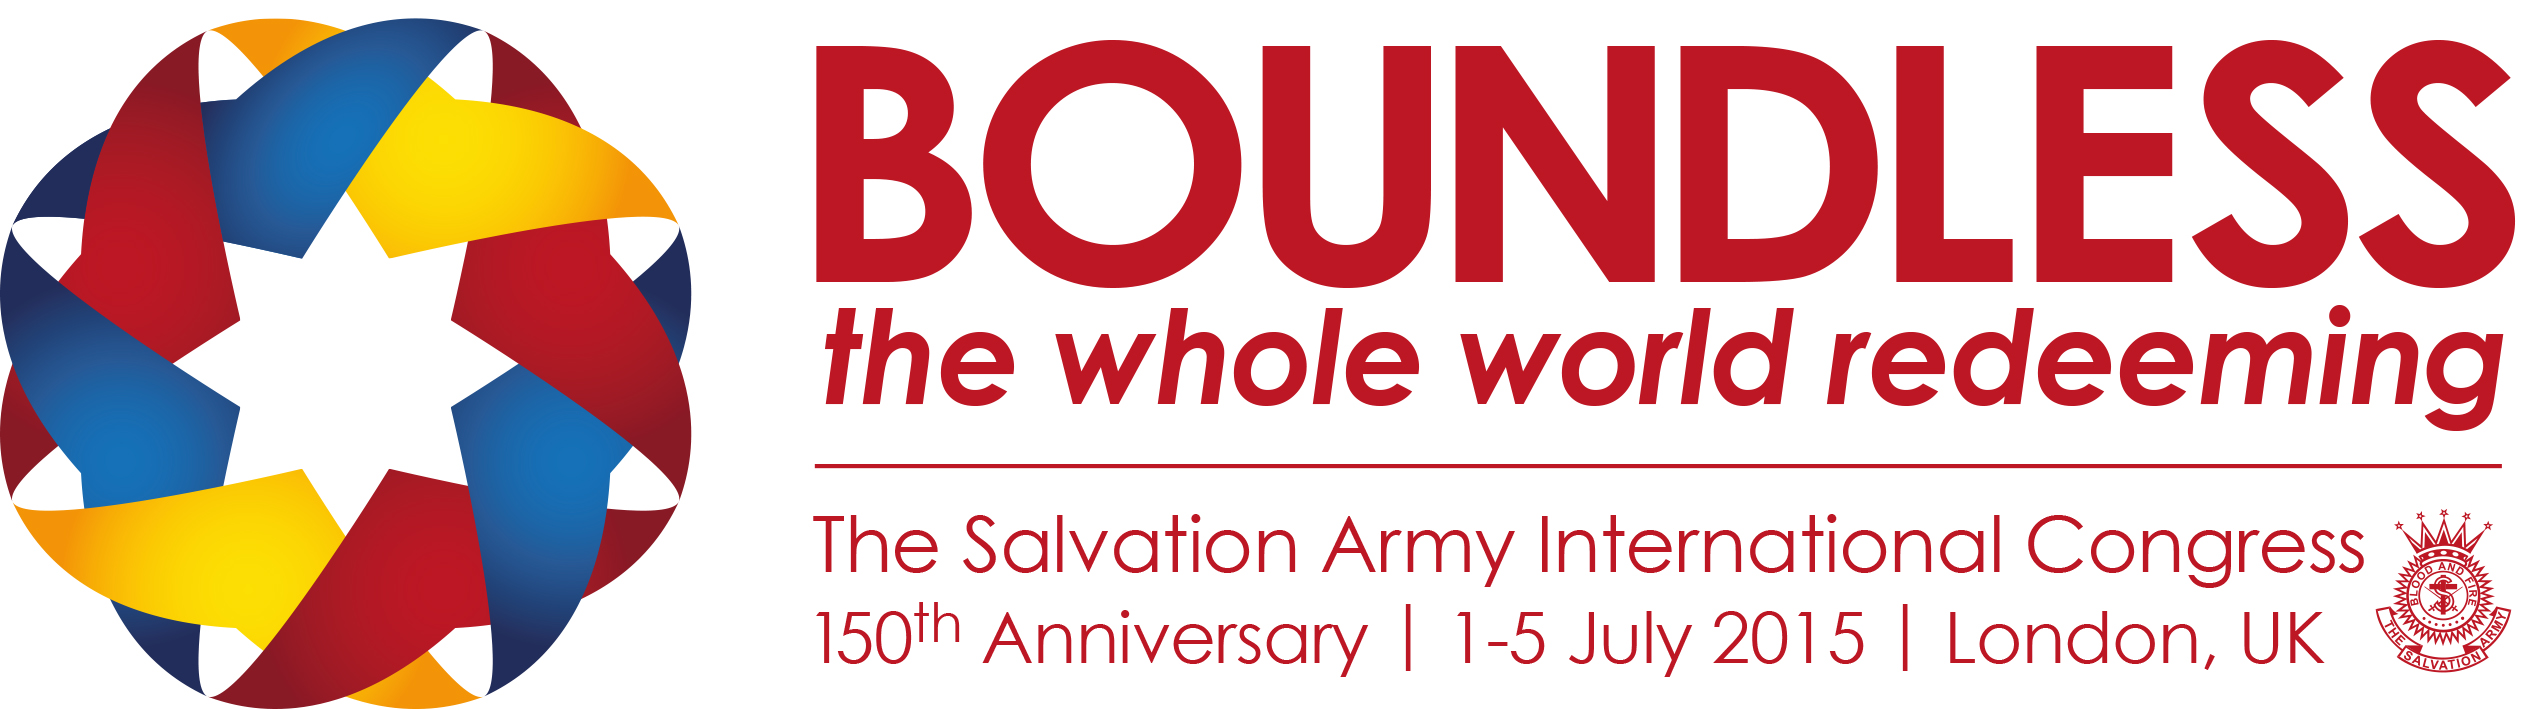 Boundless 2015 resources boundless 2015 logo toneelgroepblik Images